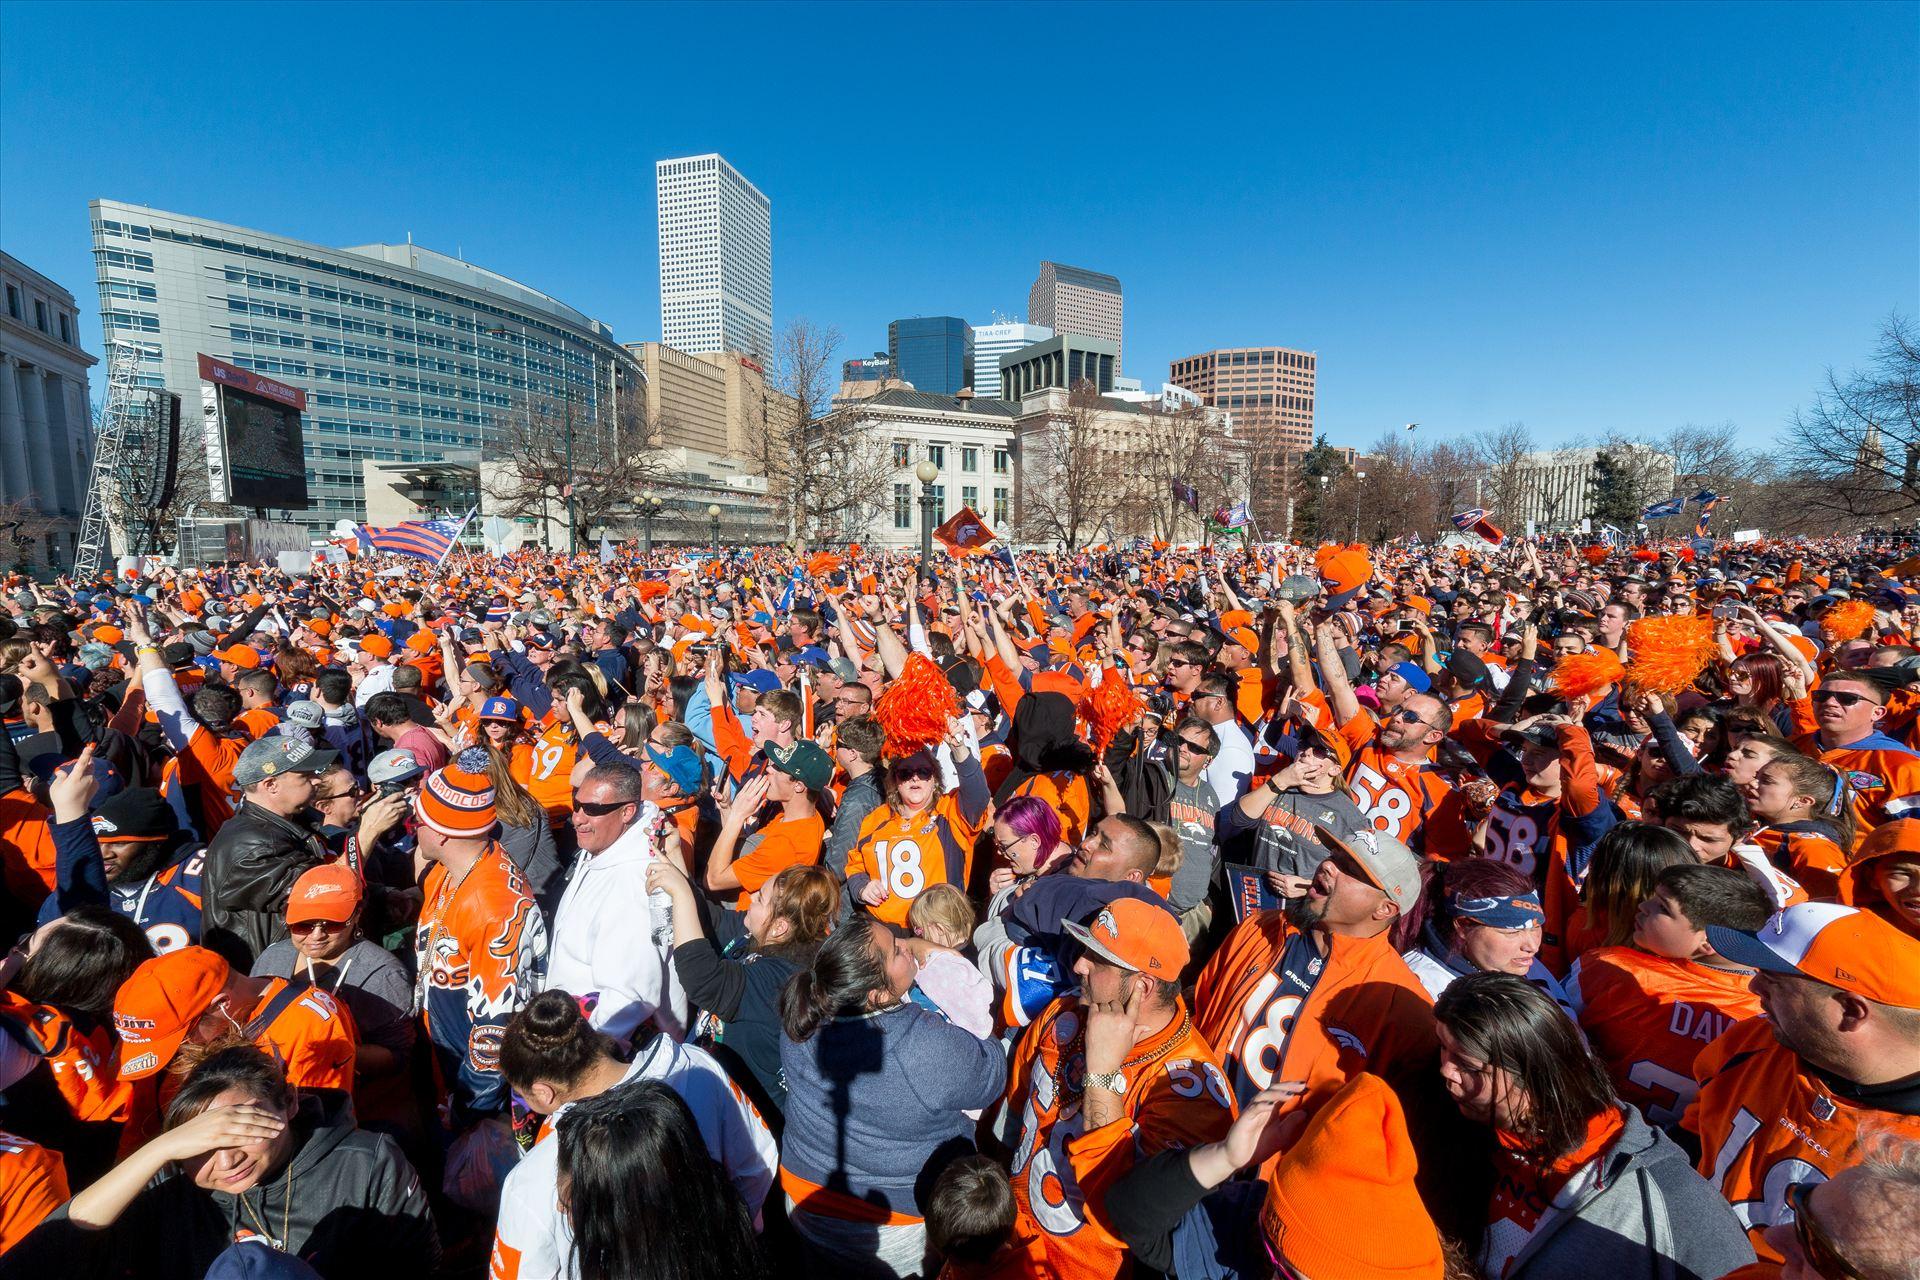 Broncos Fans 2 - The best fans in the world descend on Civic Center Park in Denver Colorado for the Broncos Superbowl victory celebration. by D Scott Smith